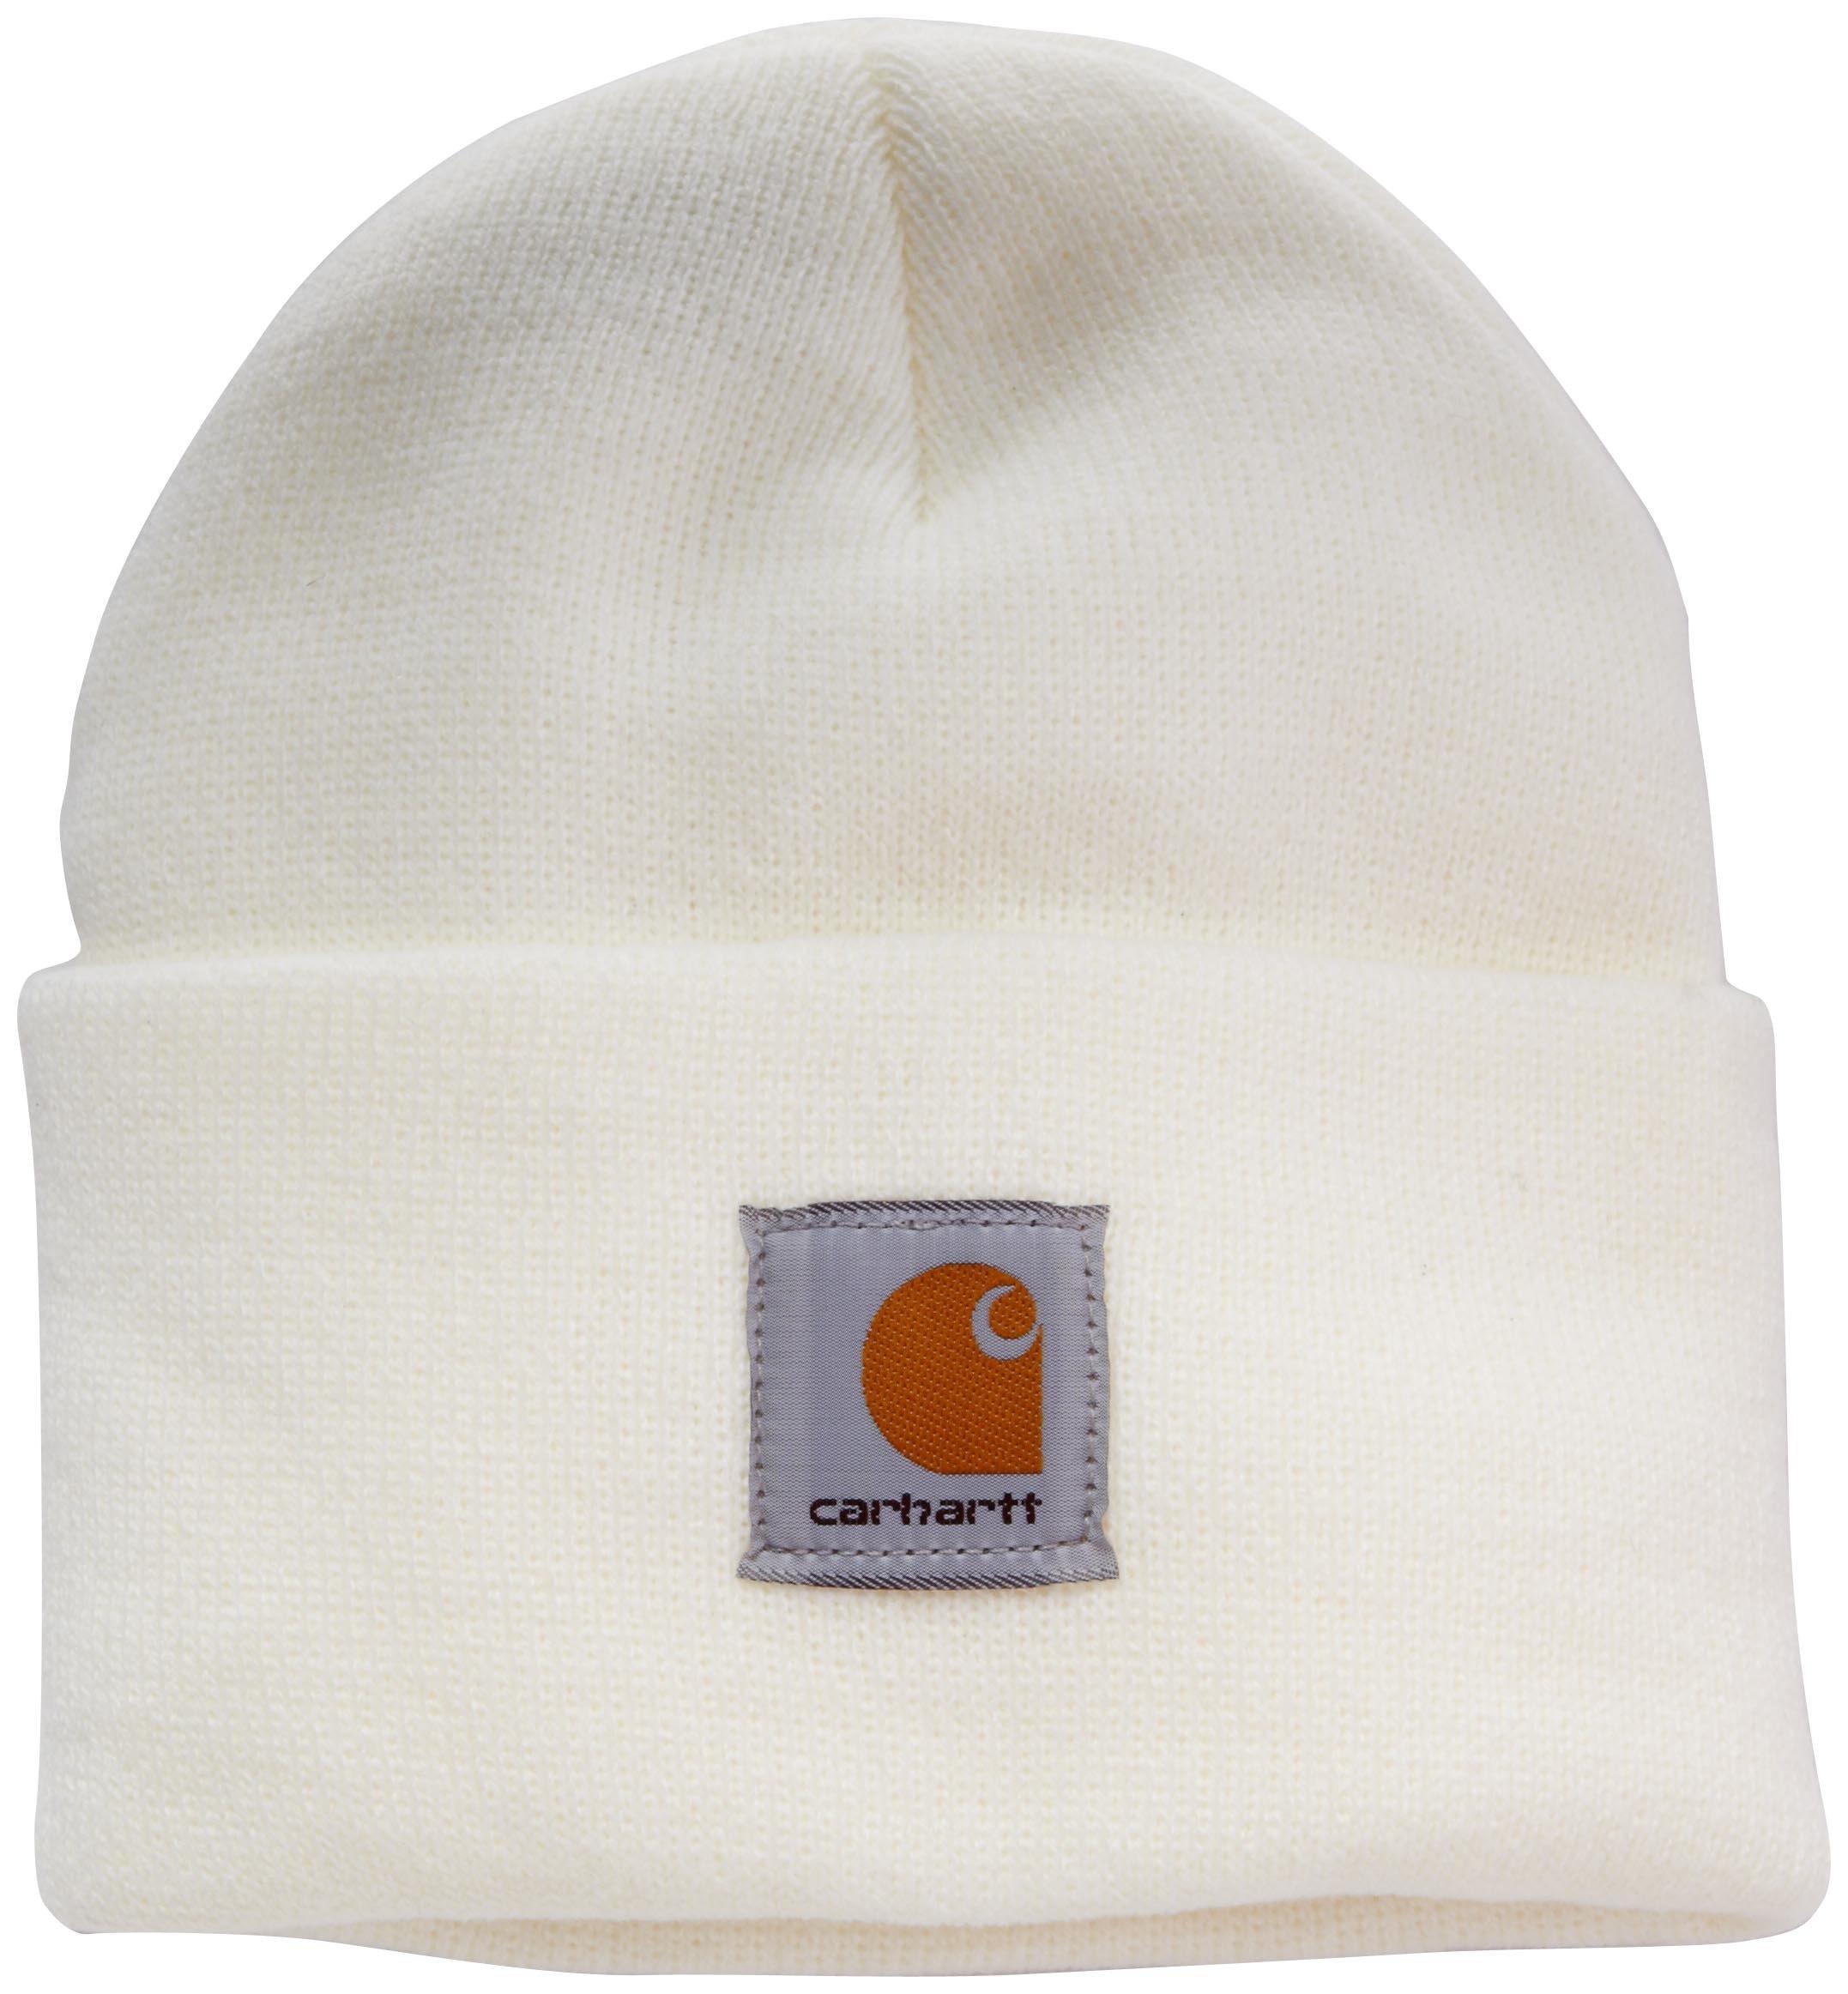 Carhartt Women's Acrylic Watch Hat, Winter White, One Size by Carhartt